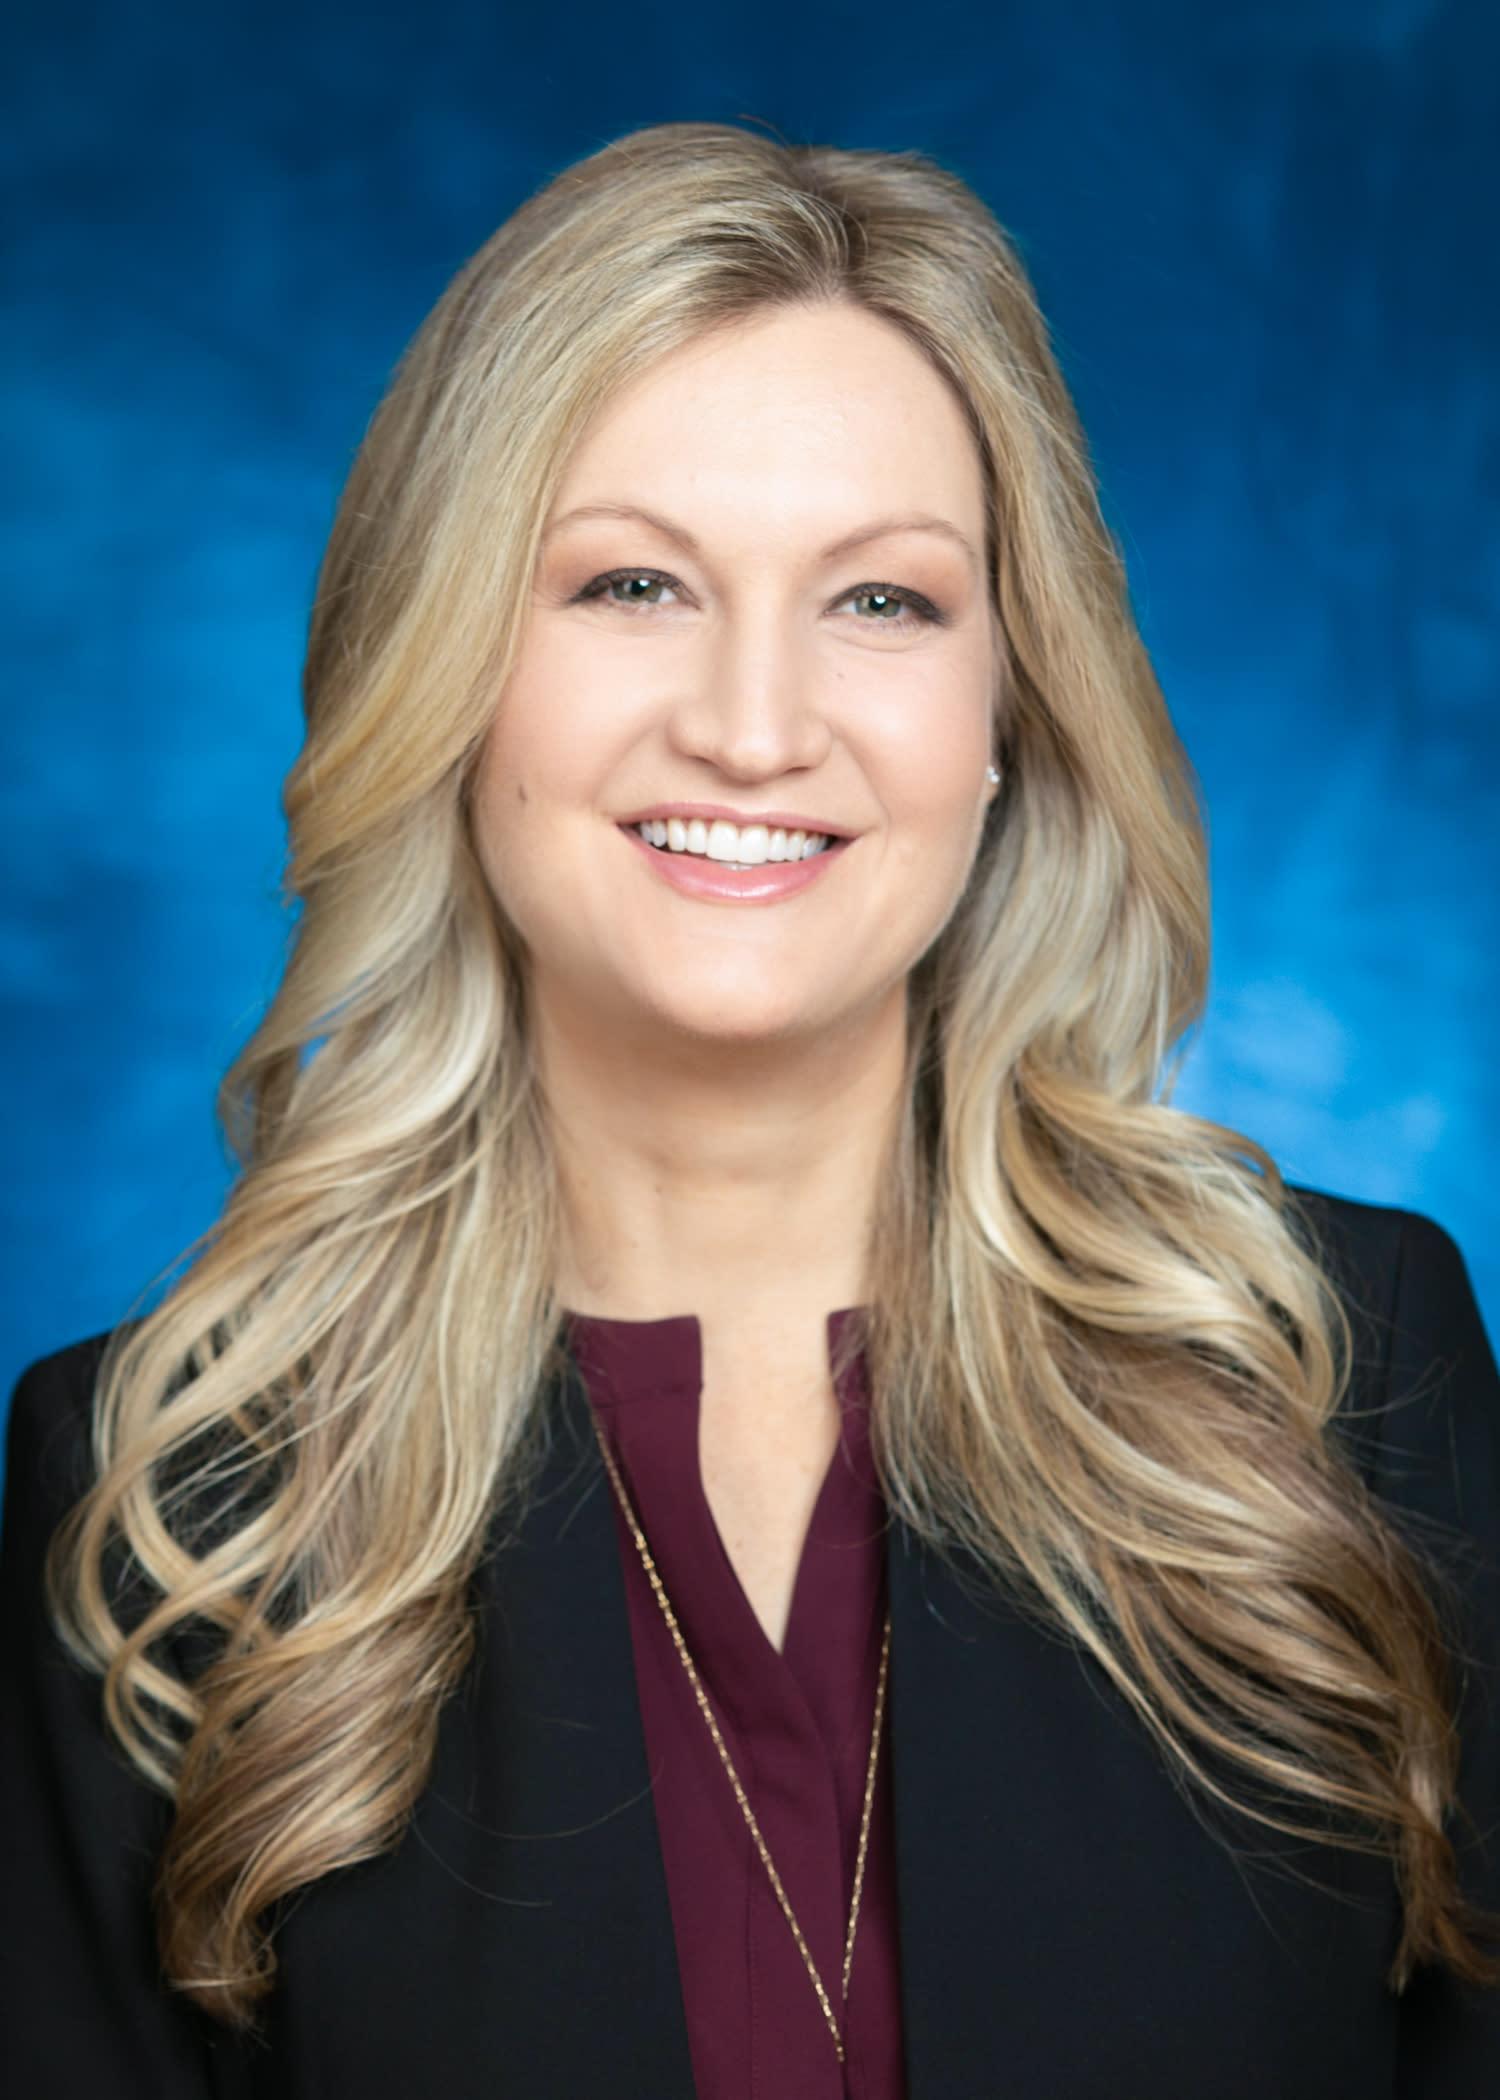 Dr. Lindsey Piegza